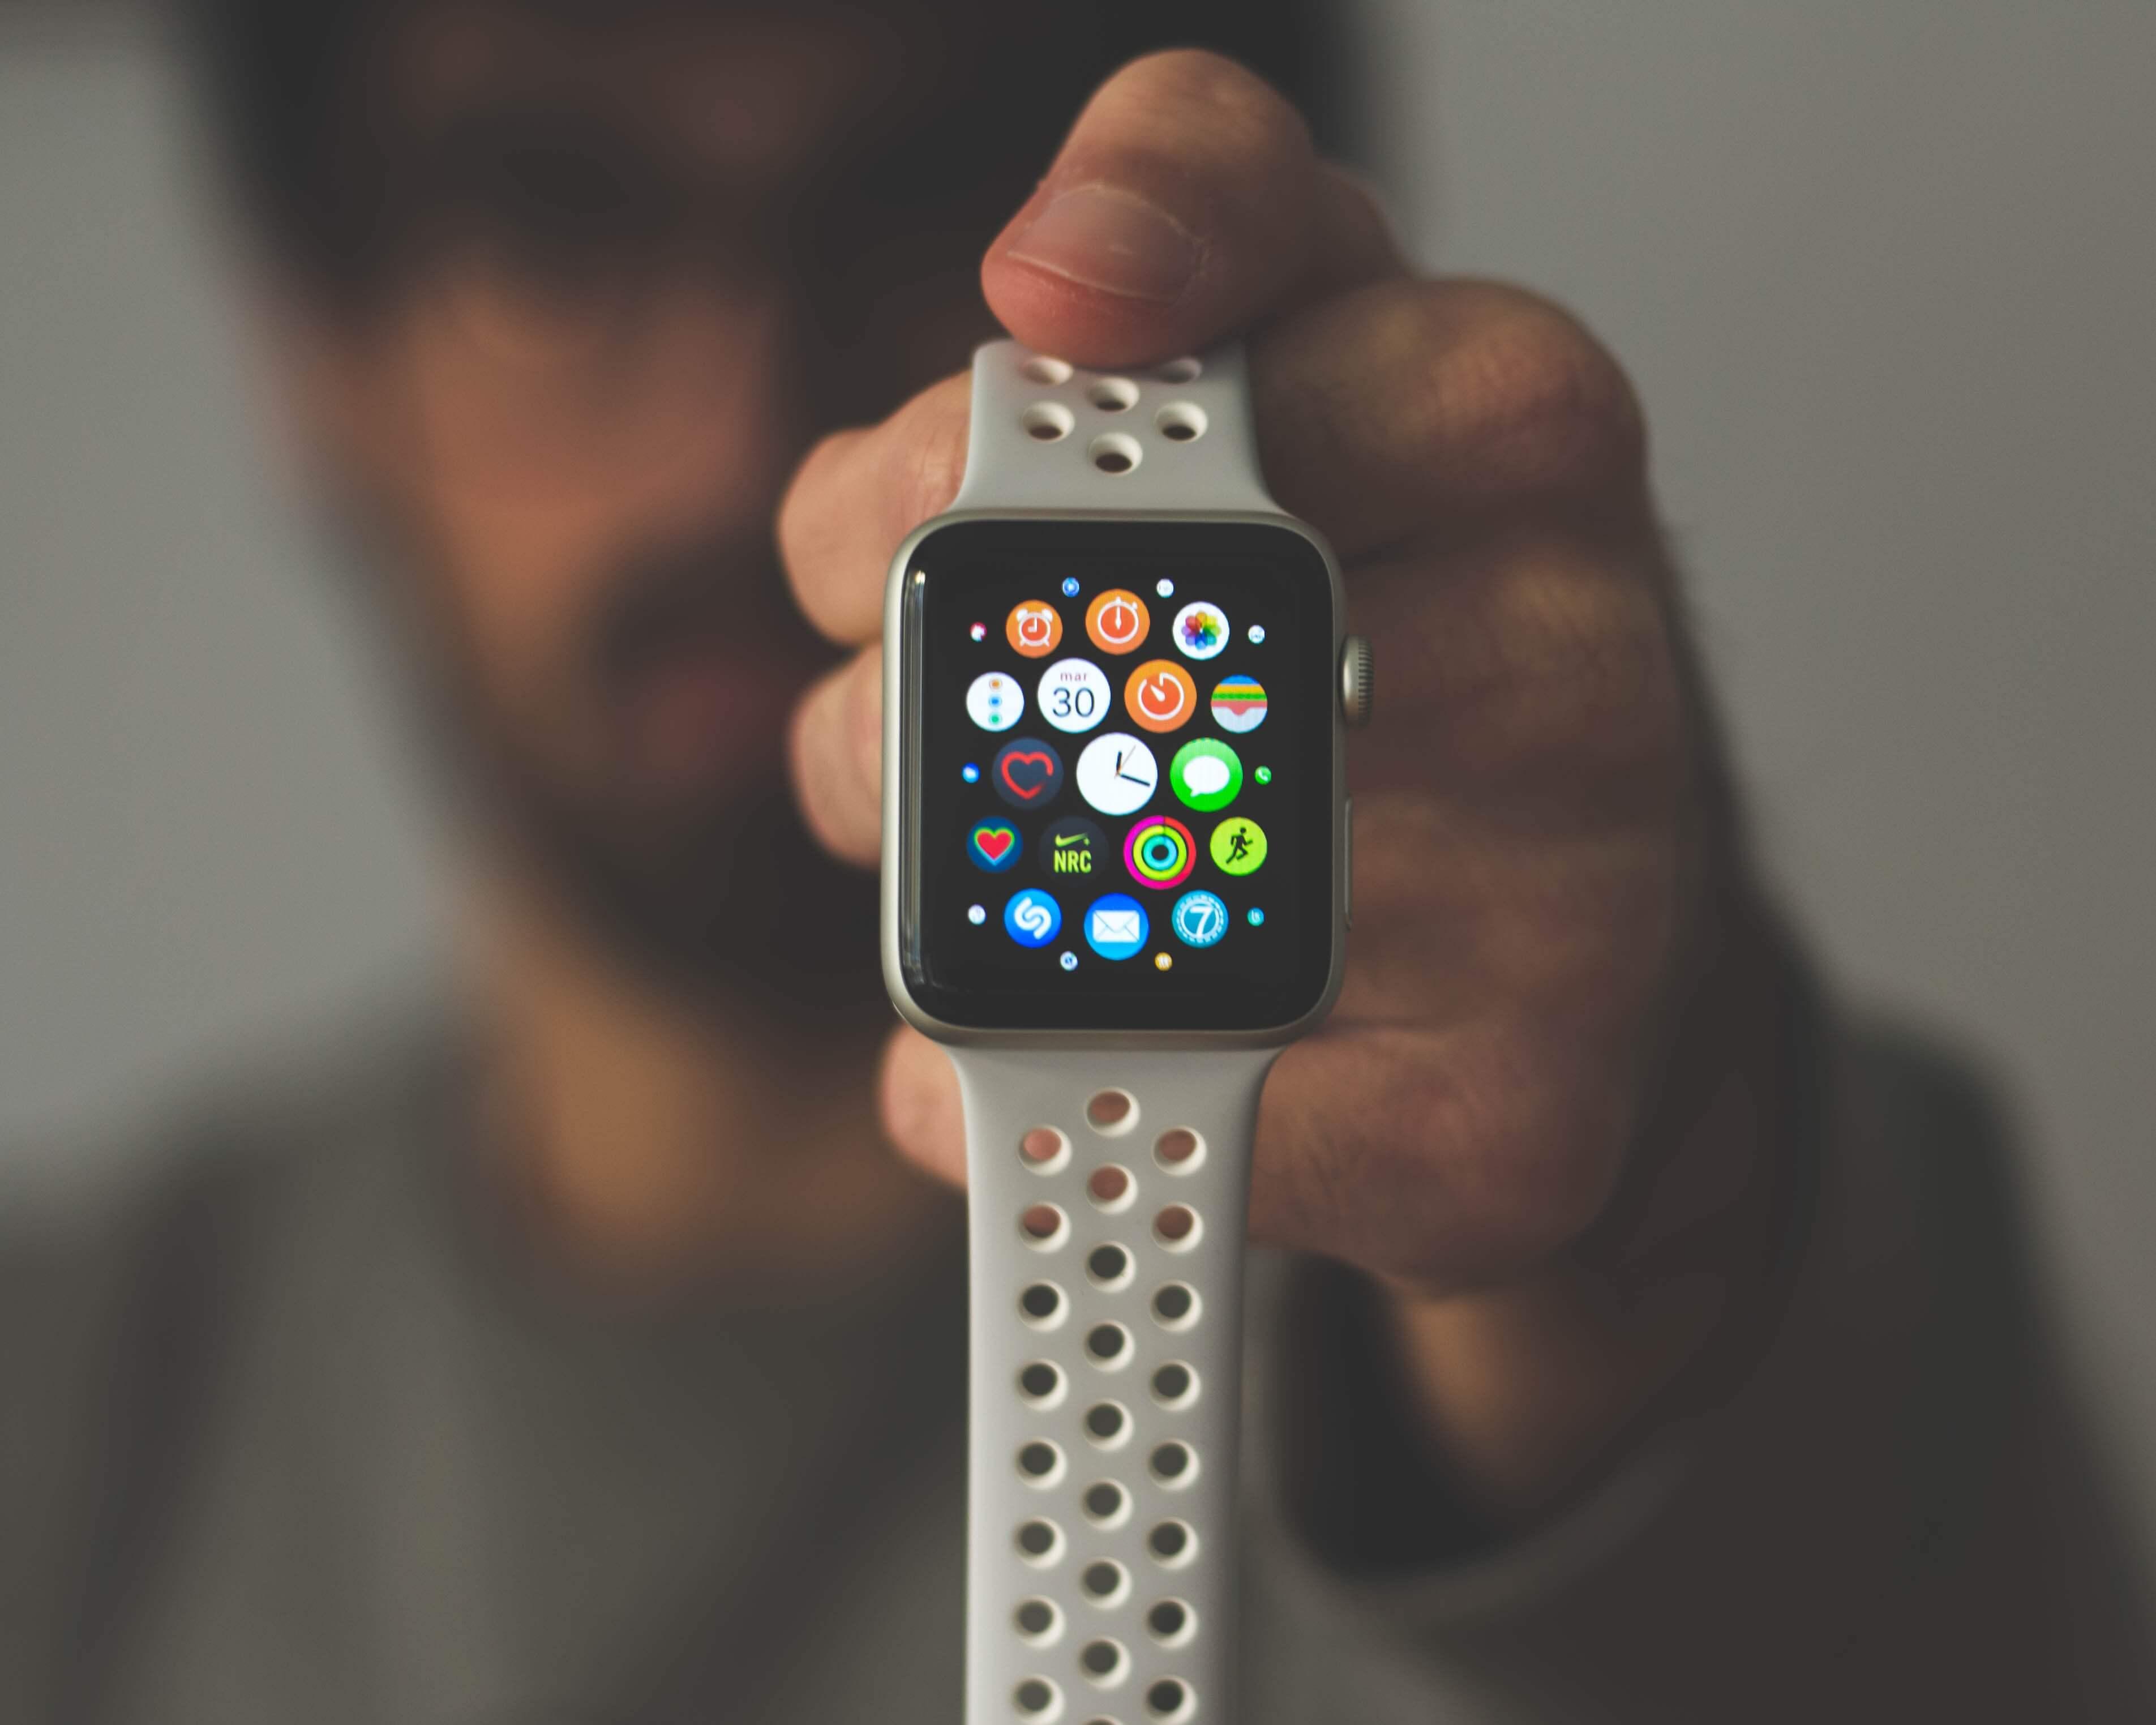 Apple Watch 4 レビュー : バッテリー持ちも問題なし!更にS3に比べて大画面化!